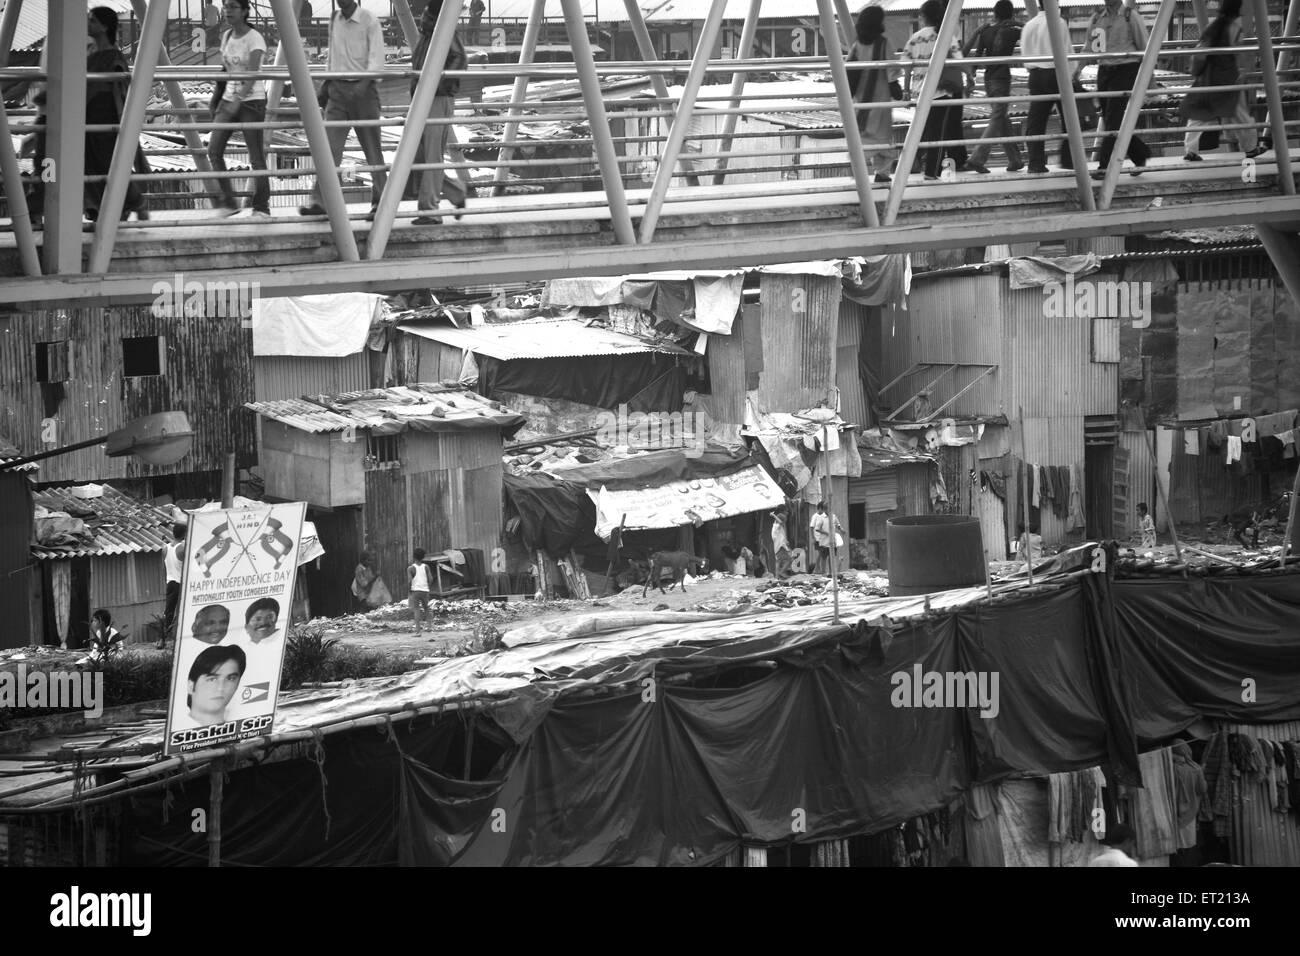 Bridge over slum behram naupada  at Anant Kanekar Marg ; Bandra ; Bombay Mumbai ; Maharashtra ; India 9 September - Stock Image